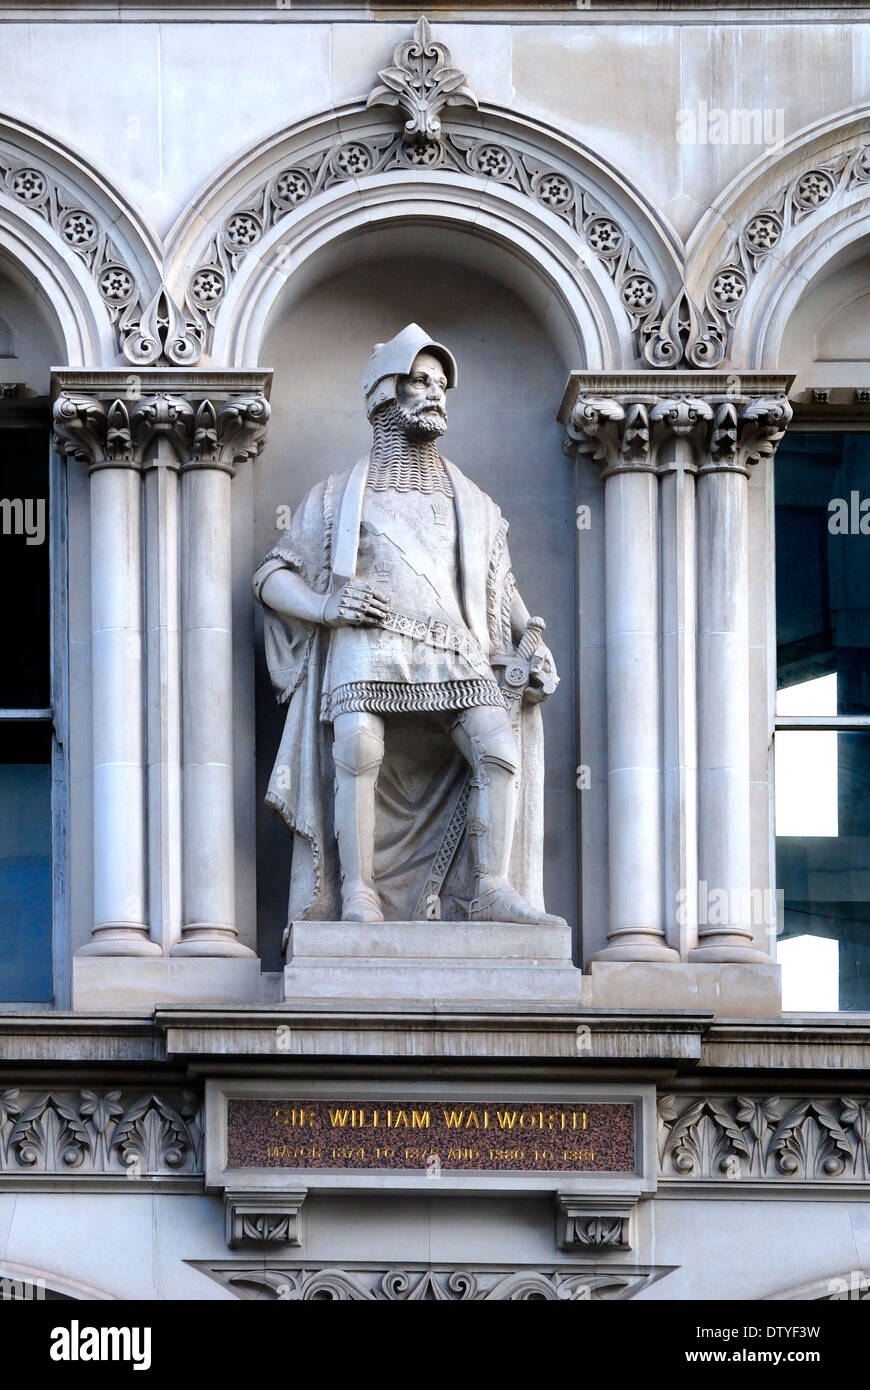 London, England, UK. Statue overlooking Holborn Viaduct: William Walworth (d1385: twice Lord mayor of London) - Stock Image